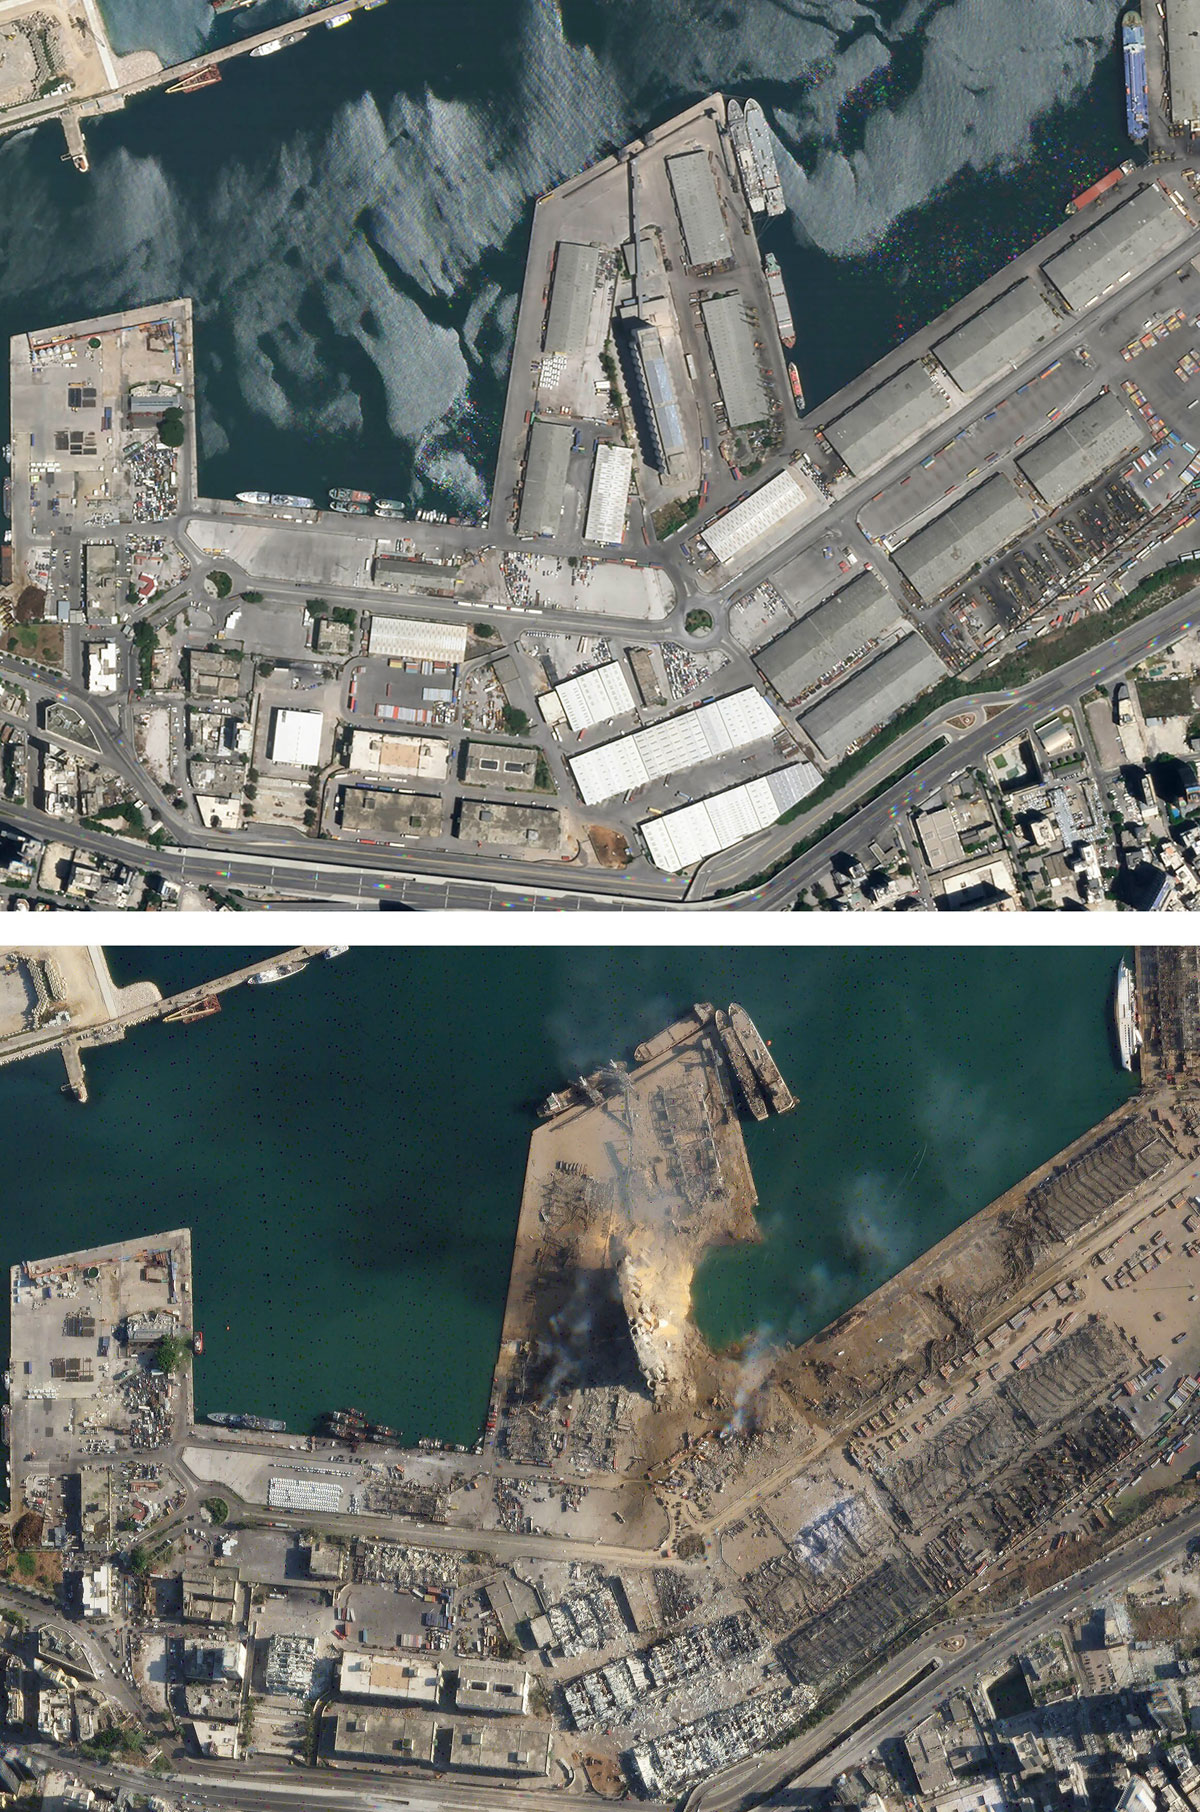 Imagen satelital de la explosión en Beirut